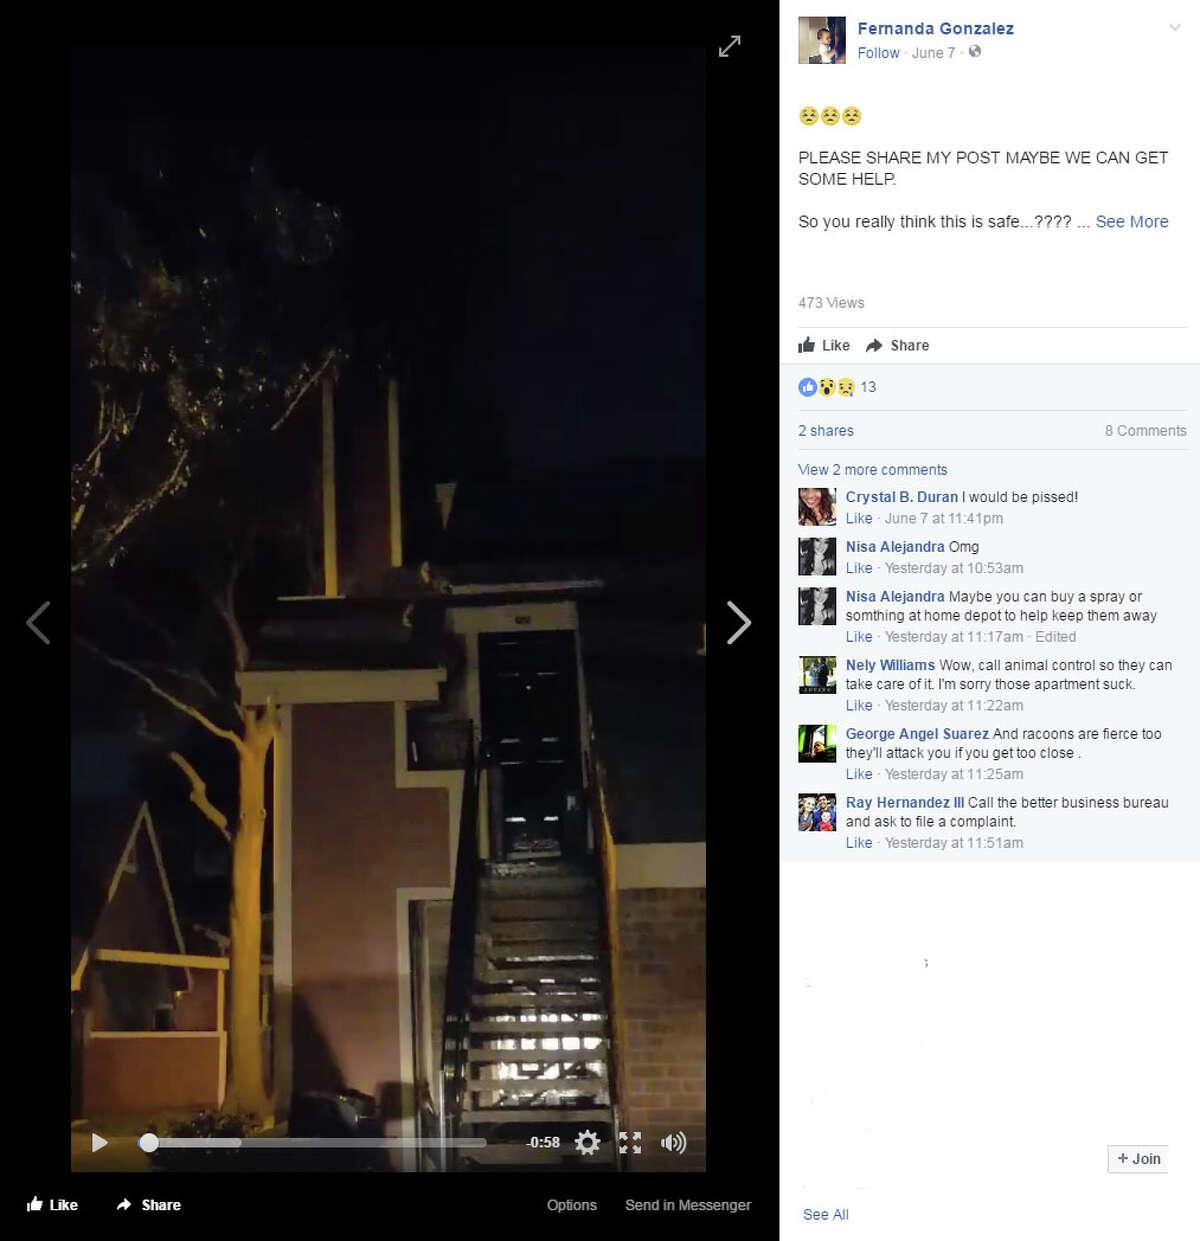 Fernanda Gonzalez, of Arlington, shared her tale of raccoon invasionvia Facebook.